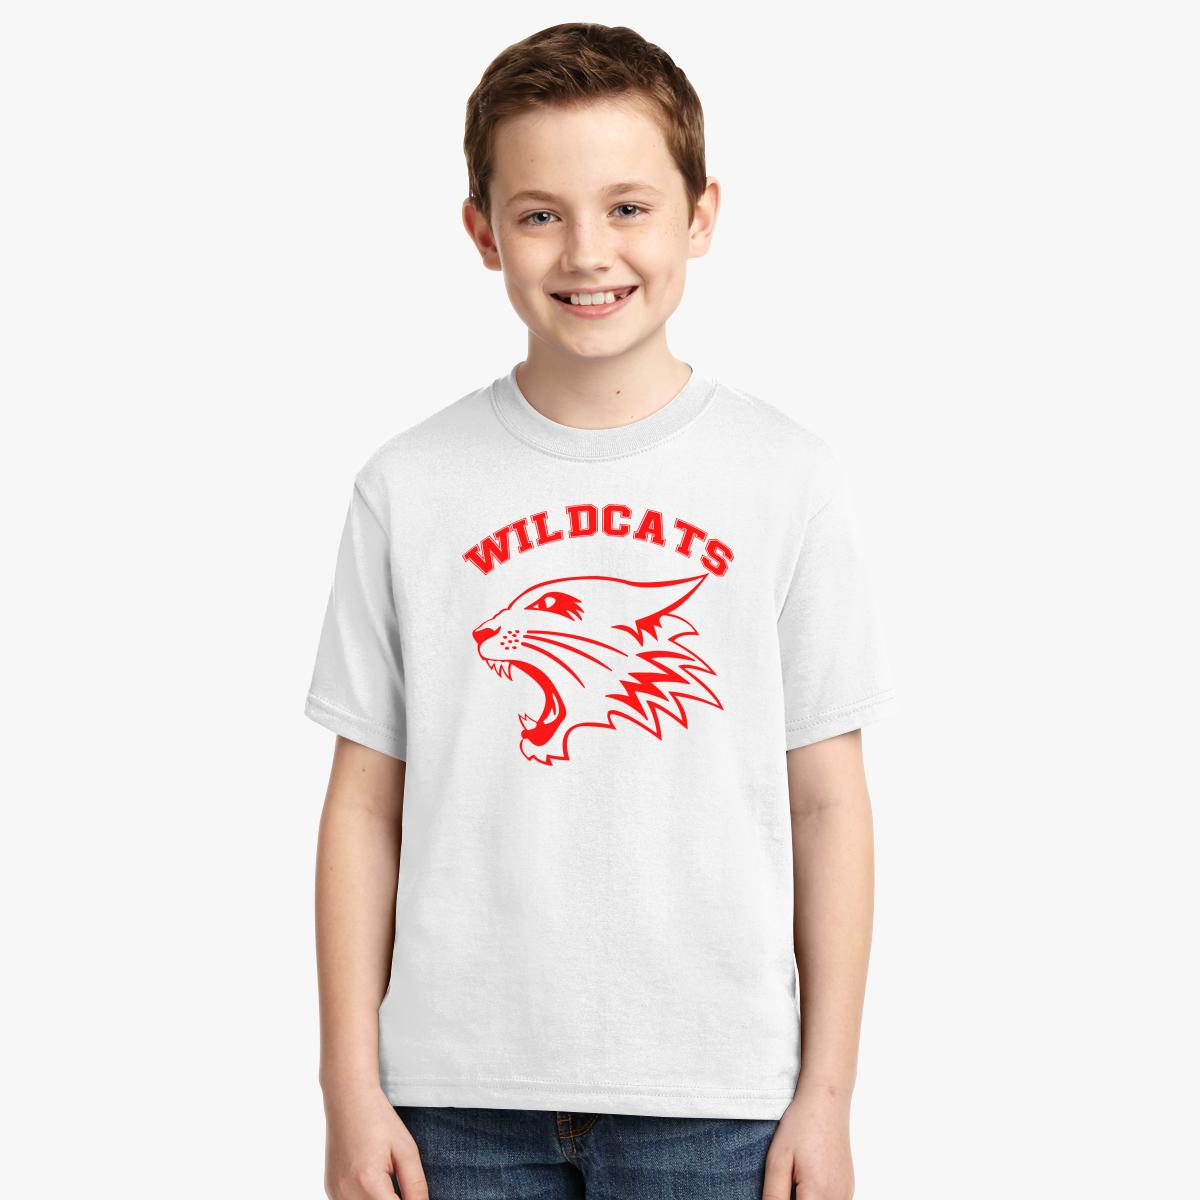 Roblox High School T Shirt Codes   RLDM